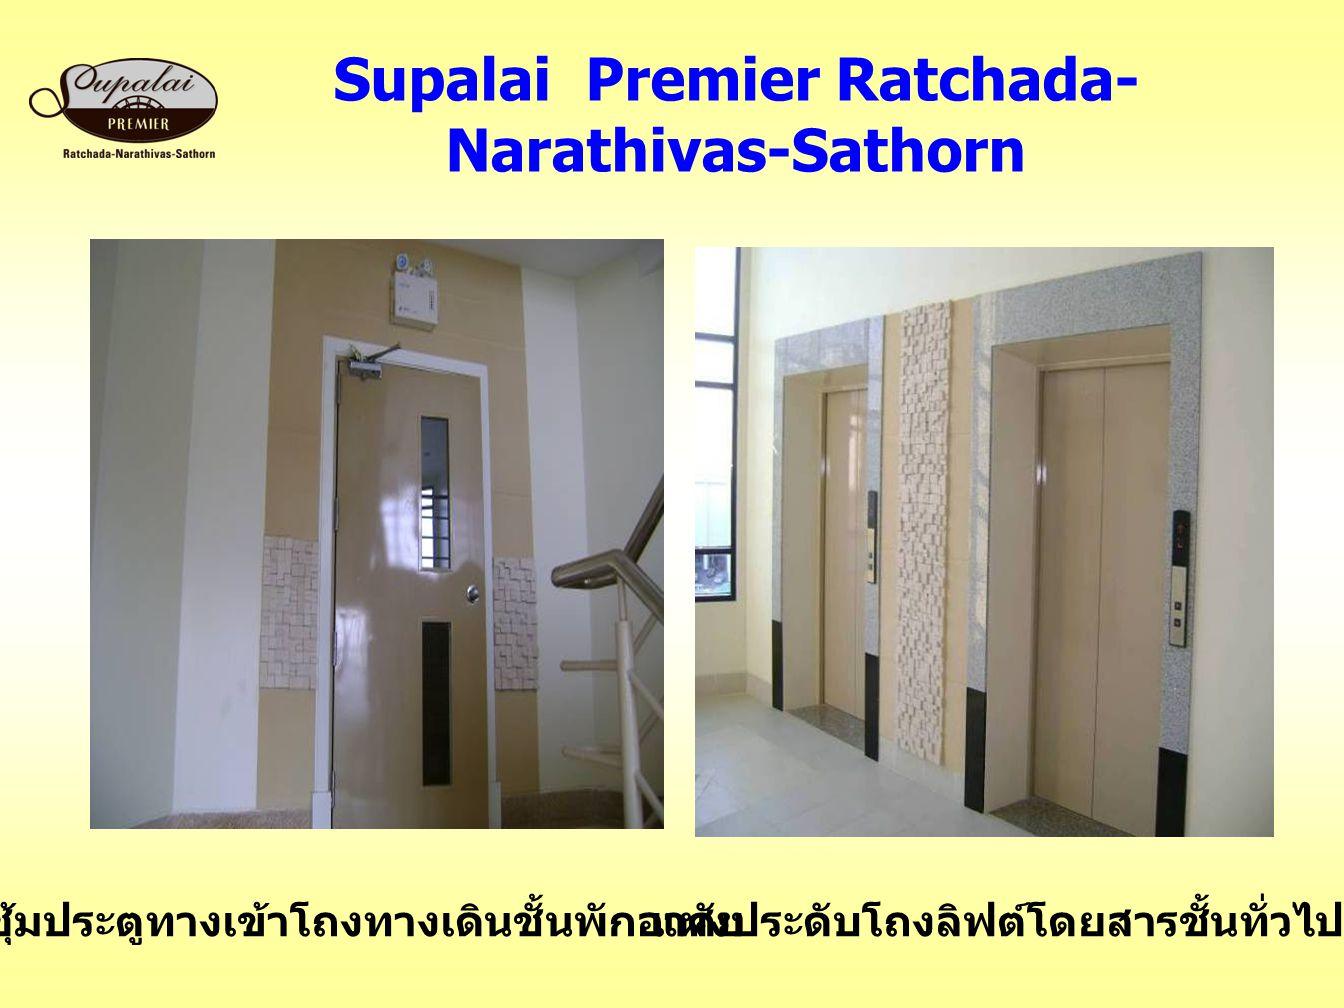 Supalai Premier Ratchada- Narathivas-Sathorn ซุ้มประตูทางเข้าโถงทางเดินชั้นพักอาศัยแผงประดับโถงลิฟต์โดยสารชั้นทั่วไป